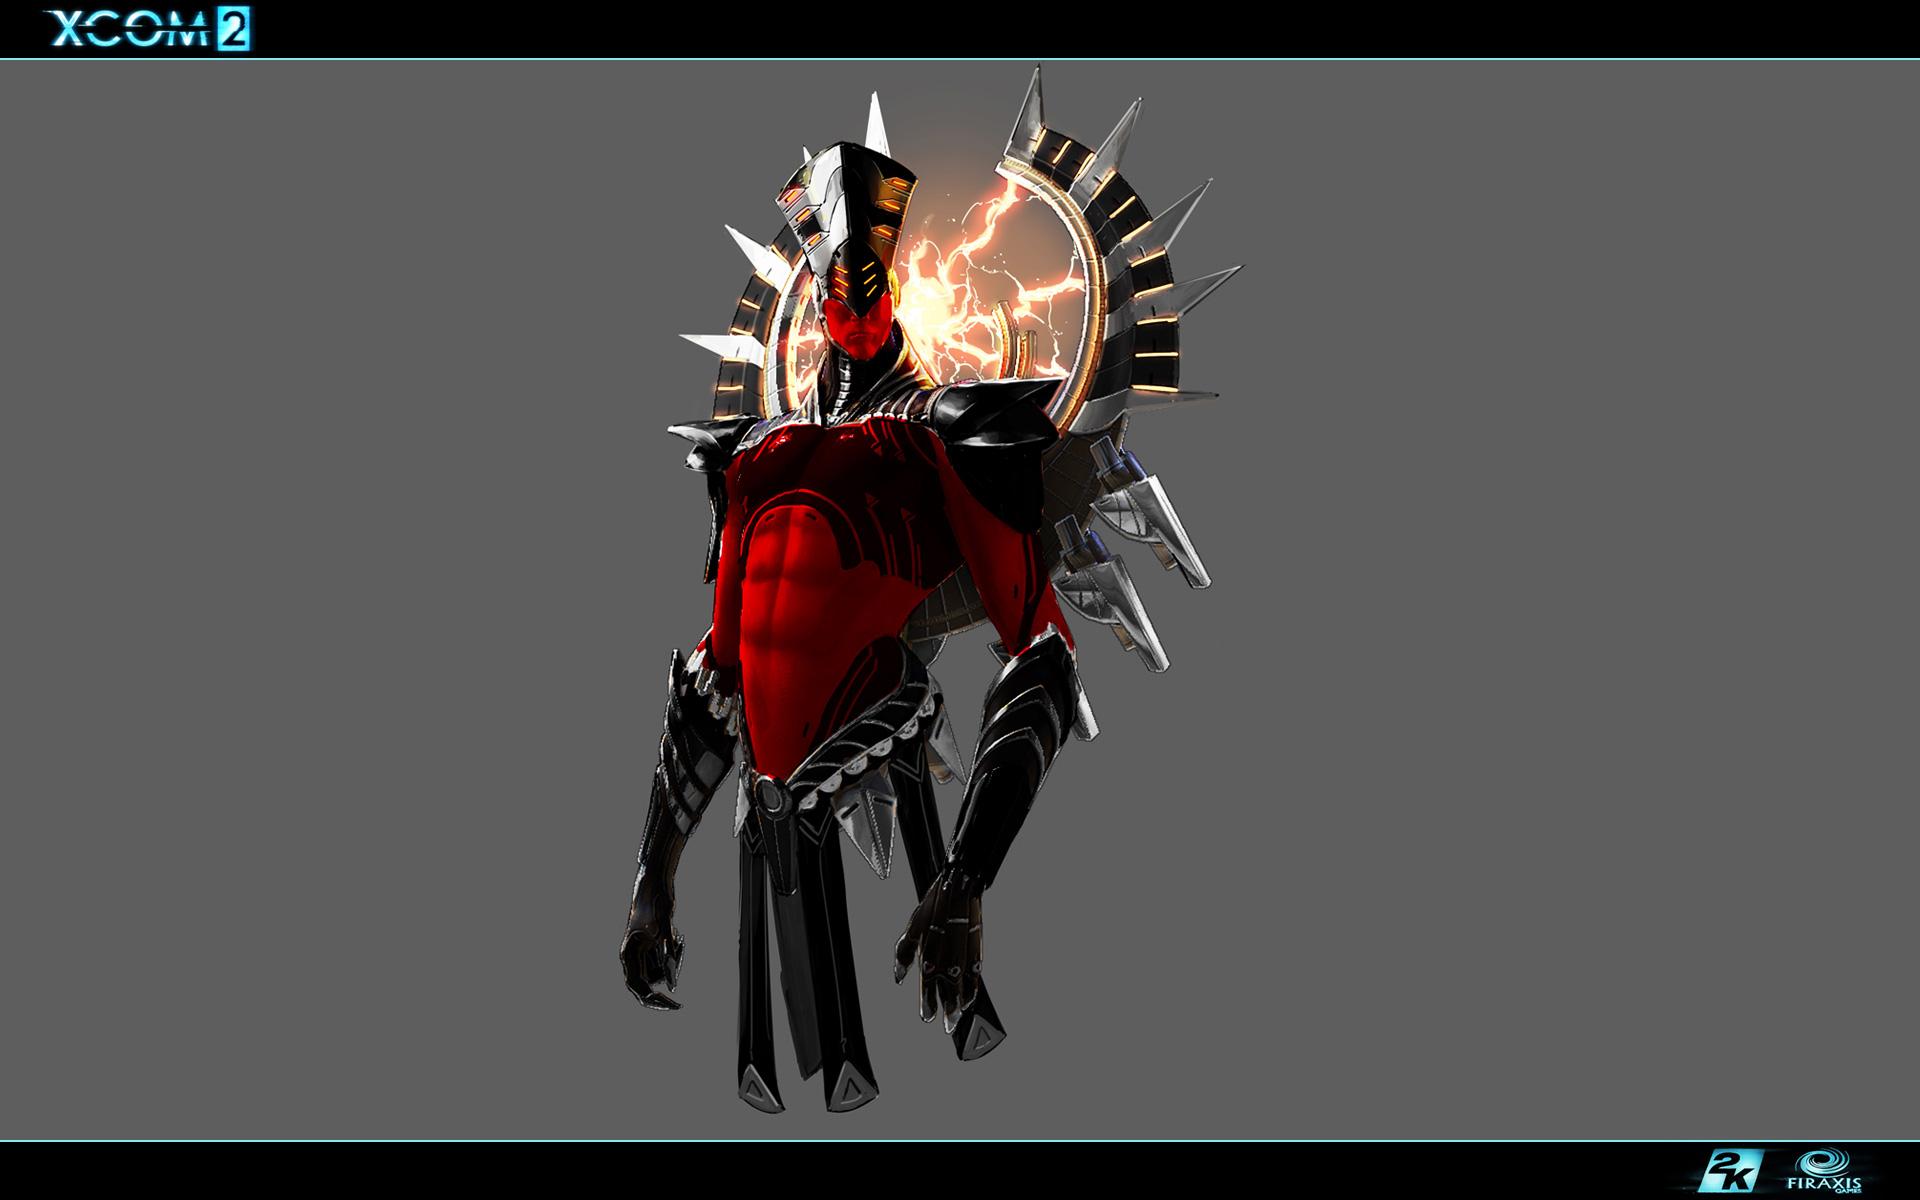 Alien Rulers (New X-COM) vs Three elite units (Old X-COM) | Spacebattles Forums